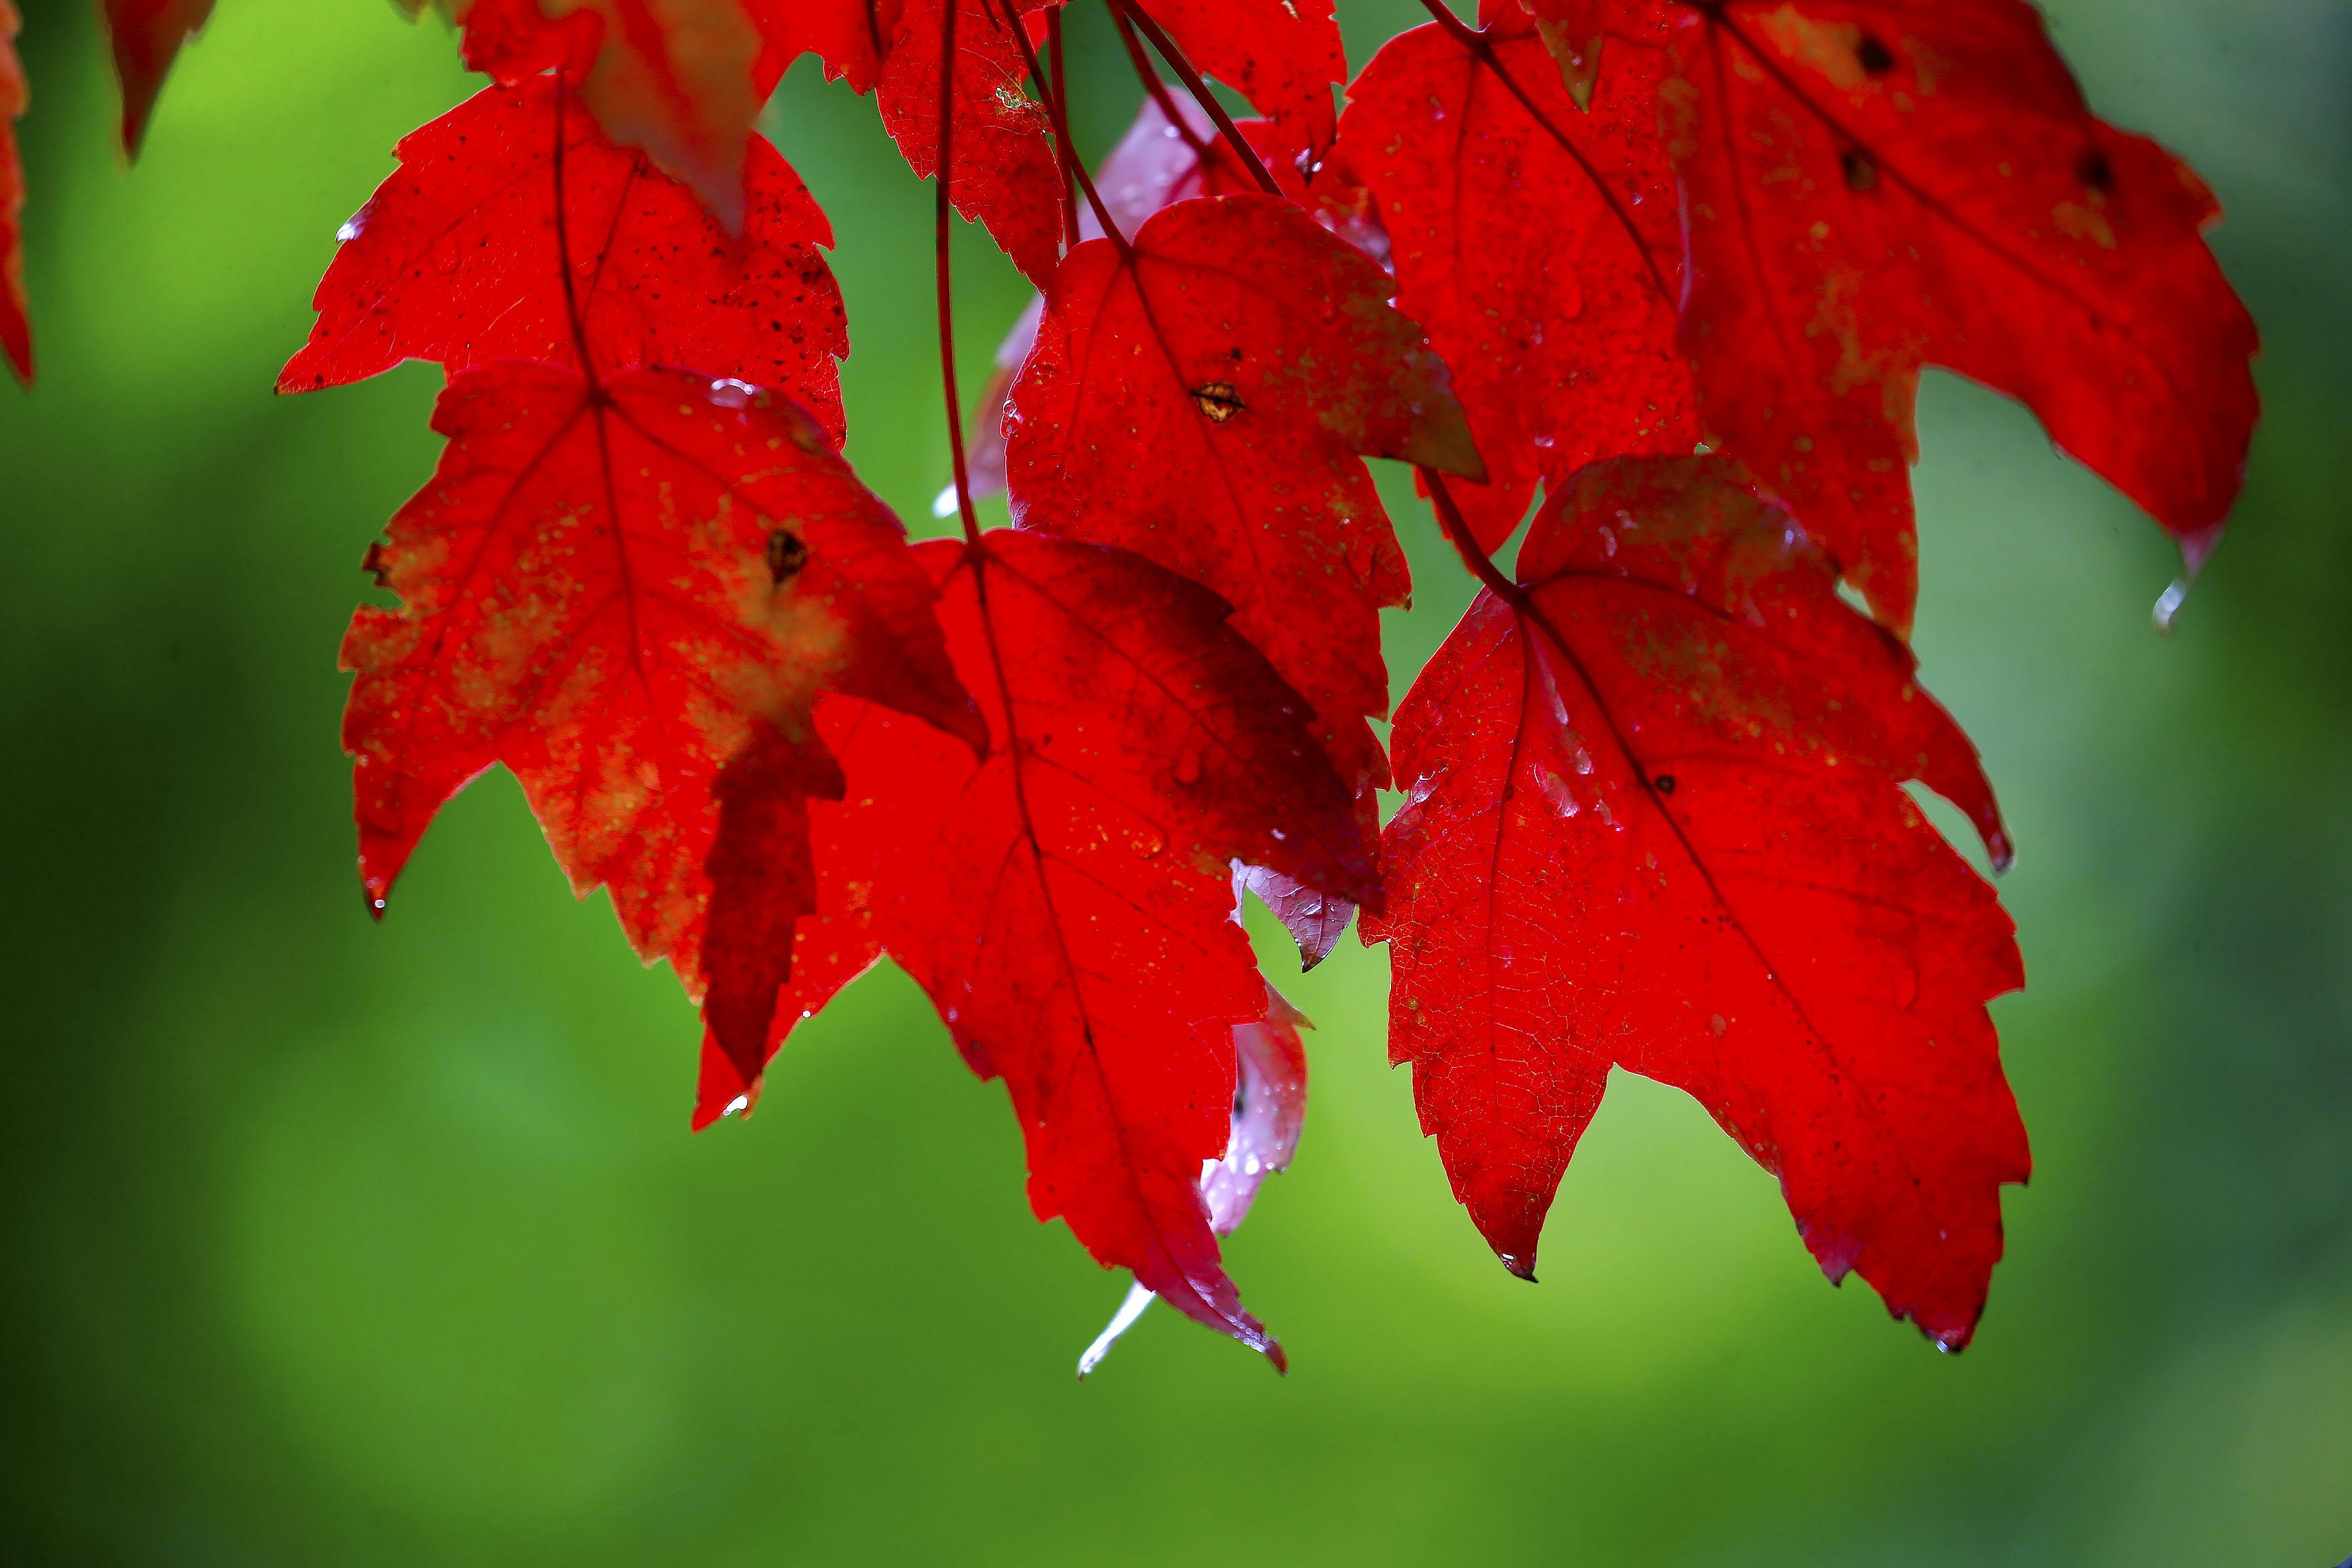 Leaves will reach peak conditions across many areas of Western New York. (Robert Kirkham/Buffalo News)